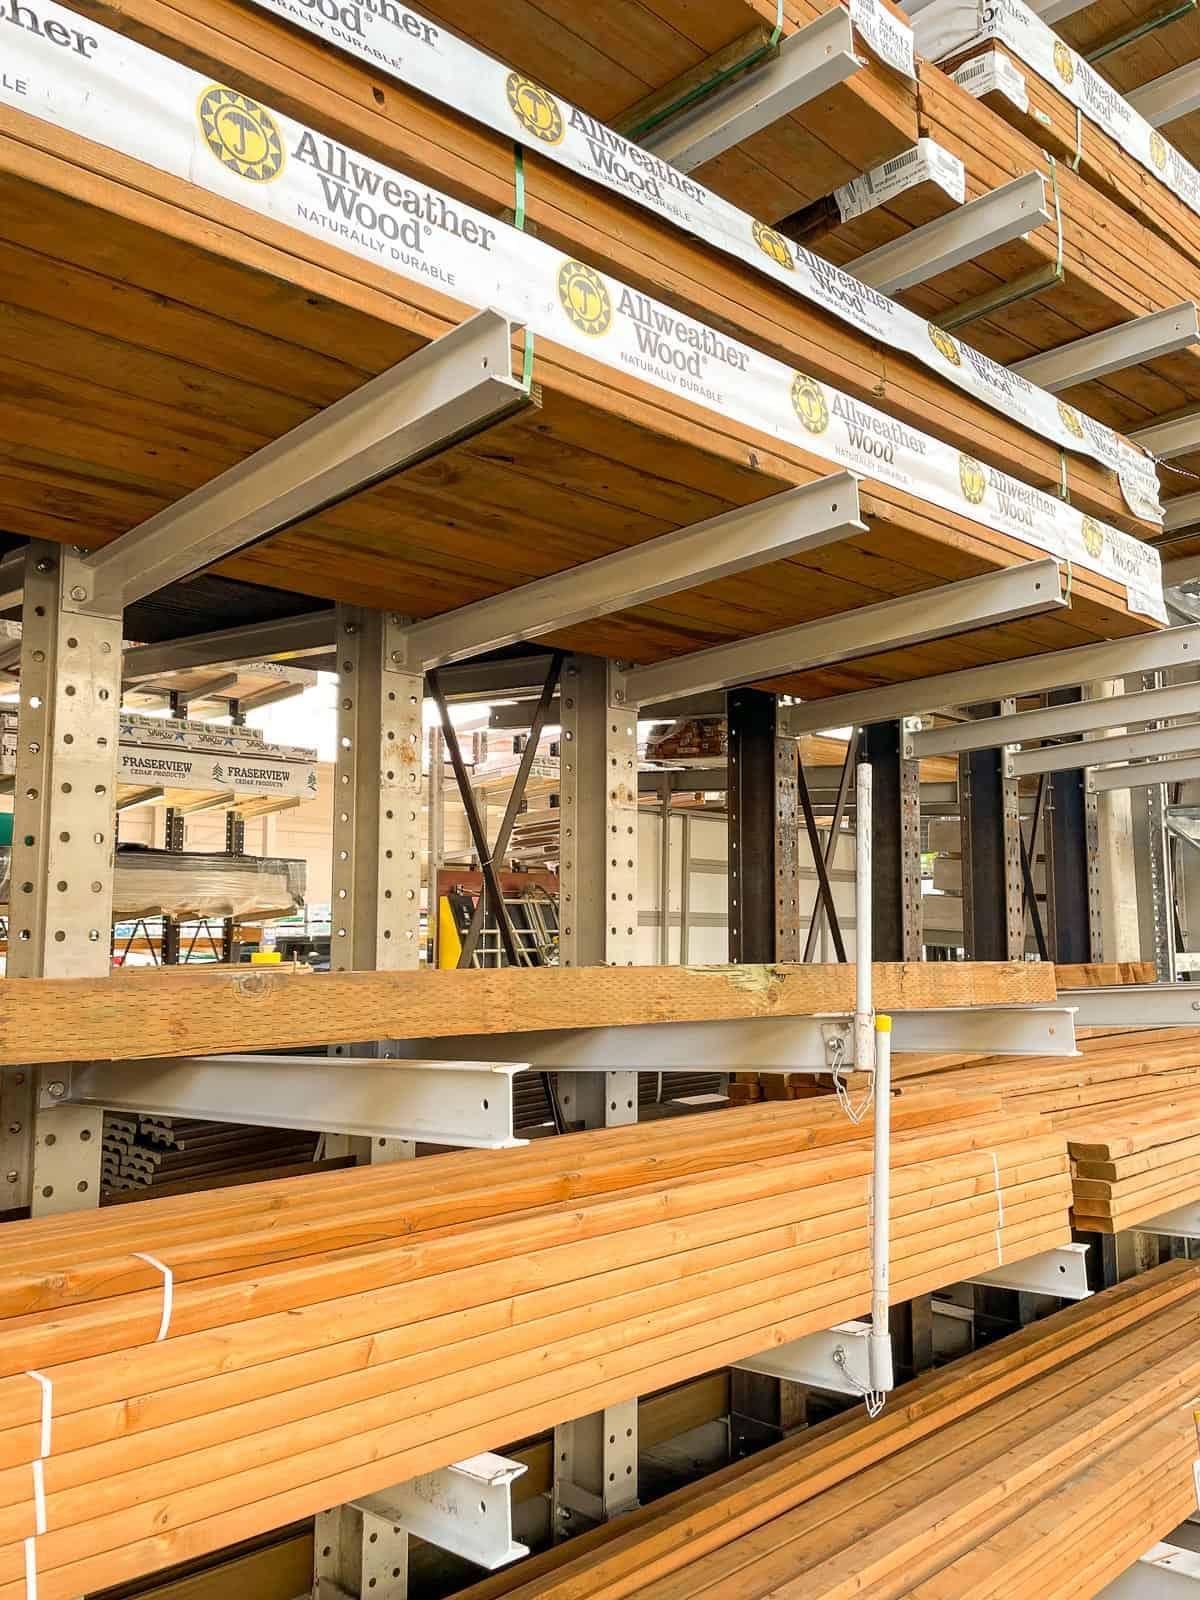 AllWeather Wood pressure treated lumber at Lowe's